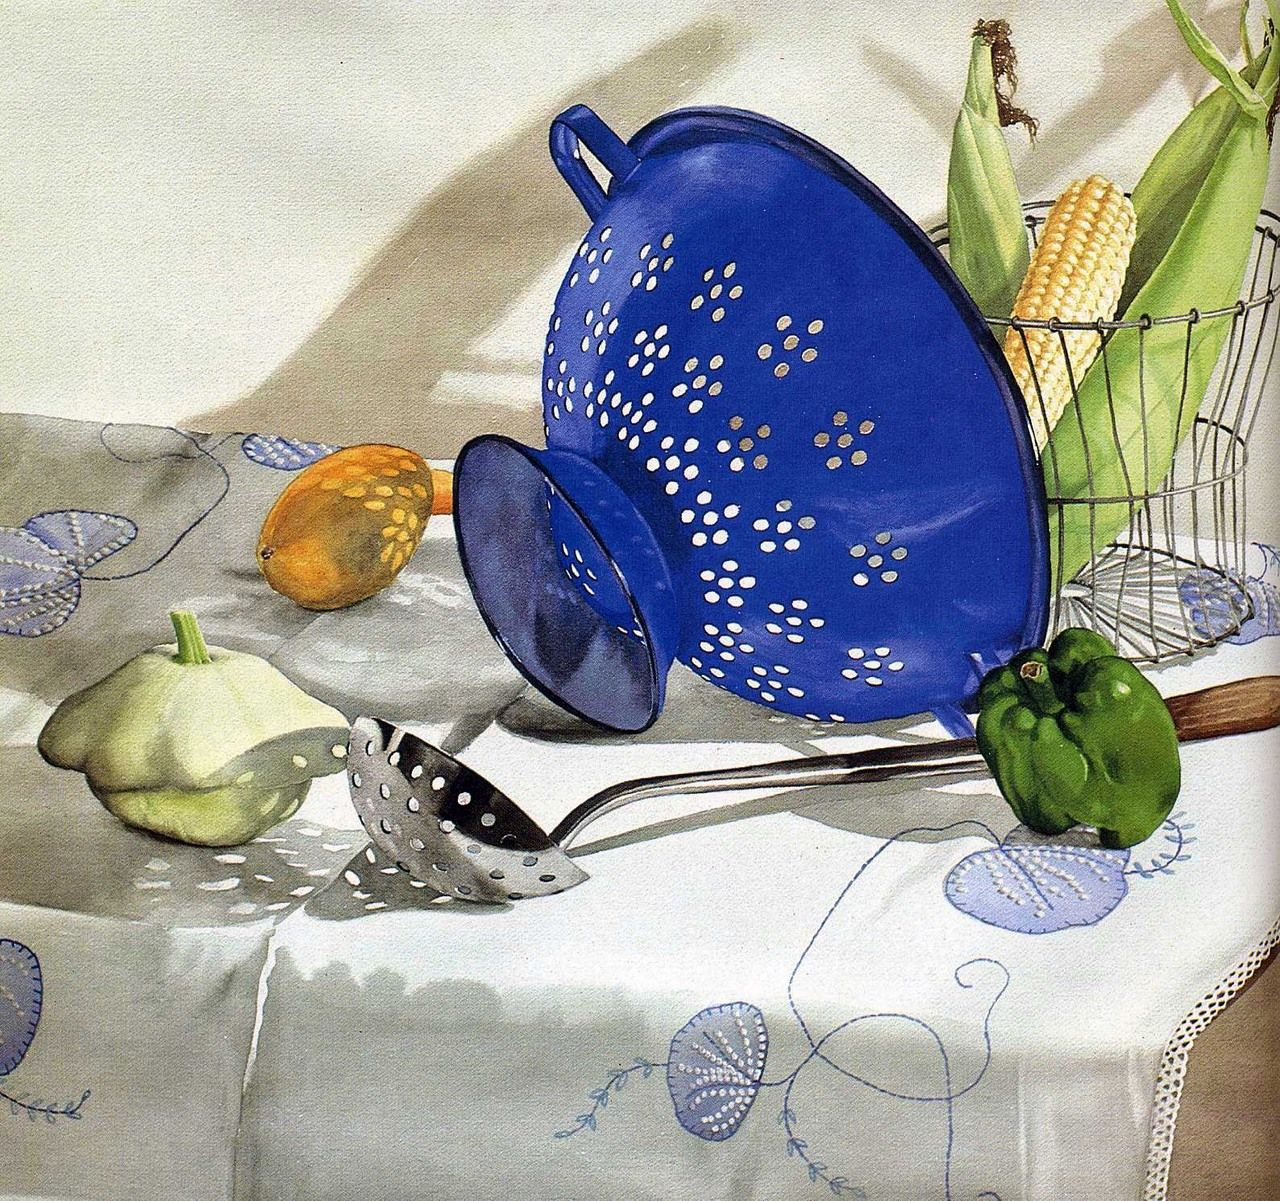 sondra freckelton paintings - Google Search | Still Life for ...